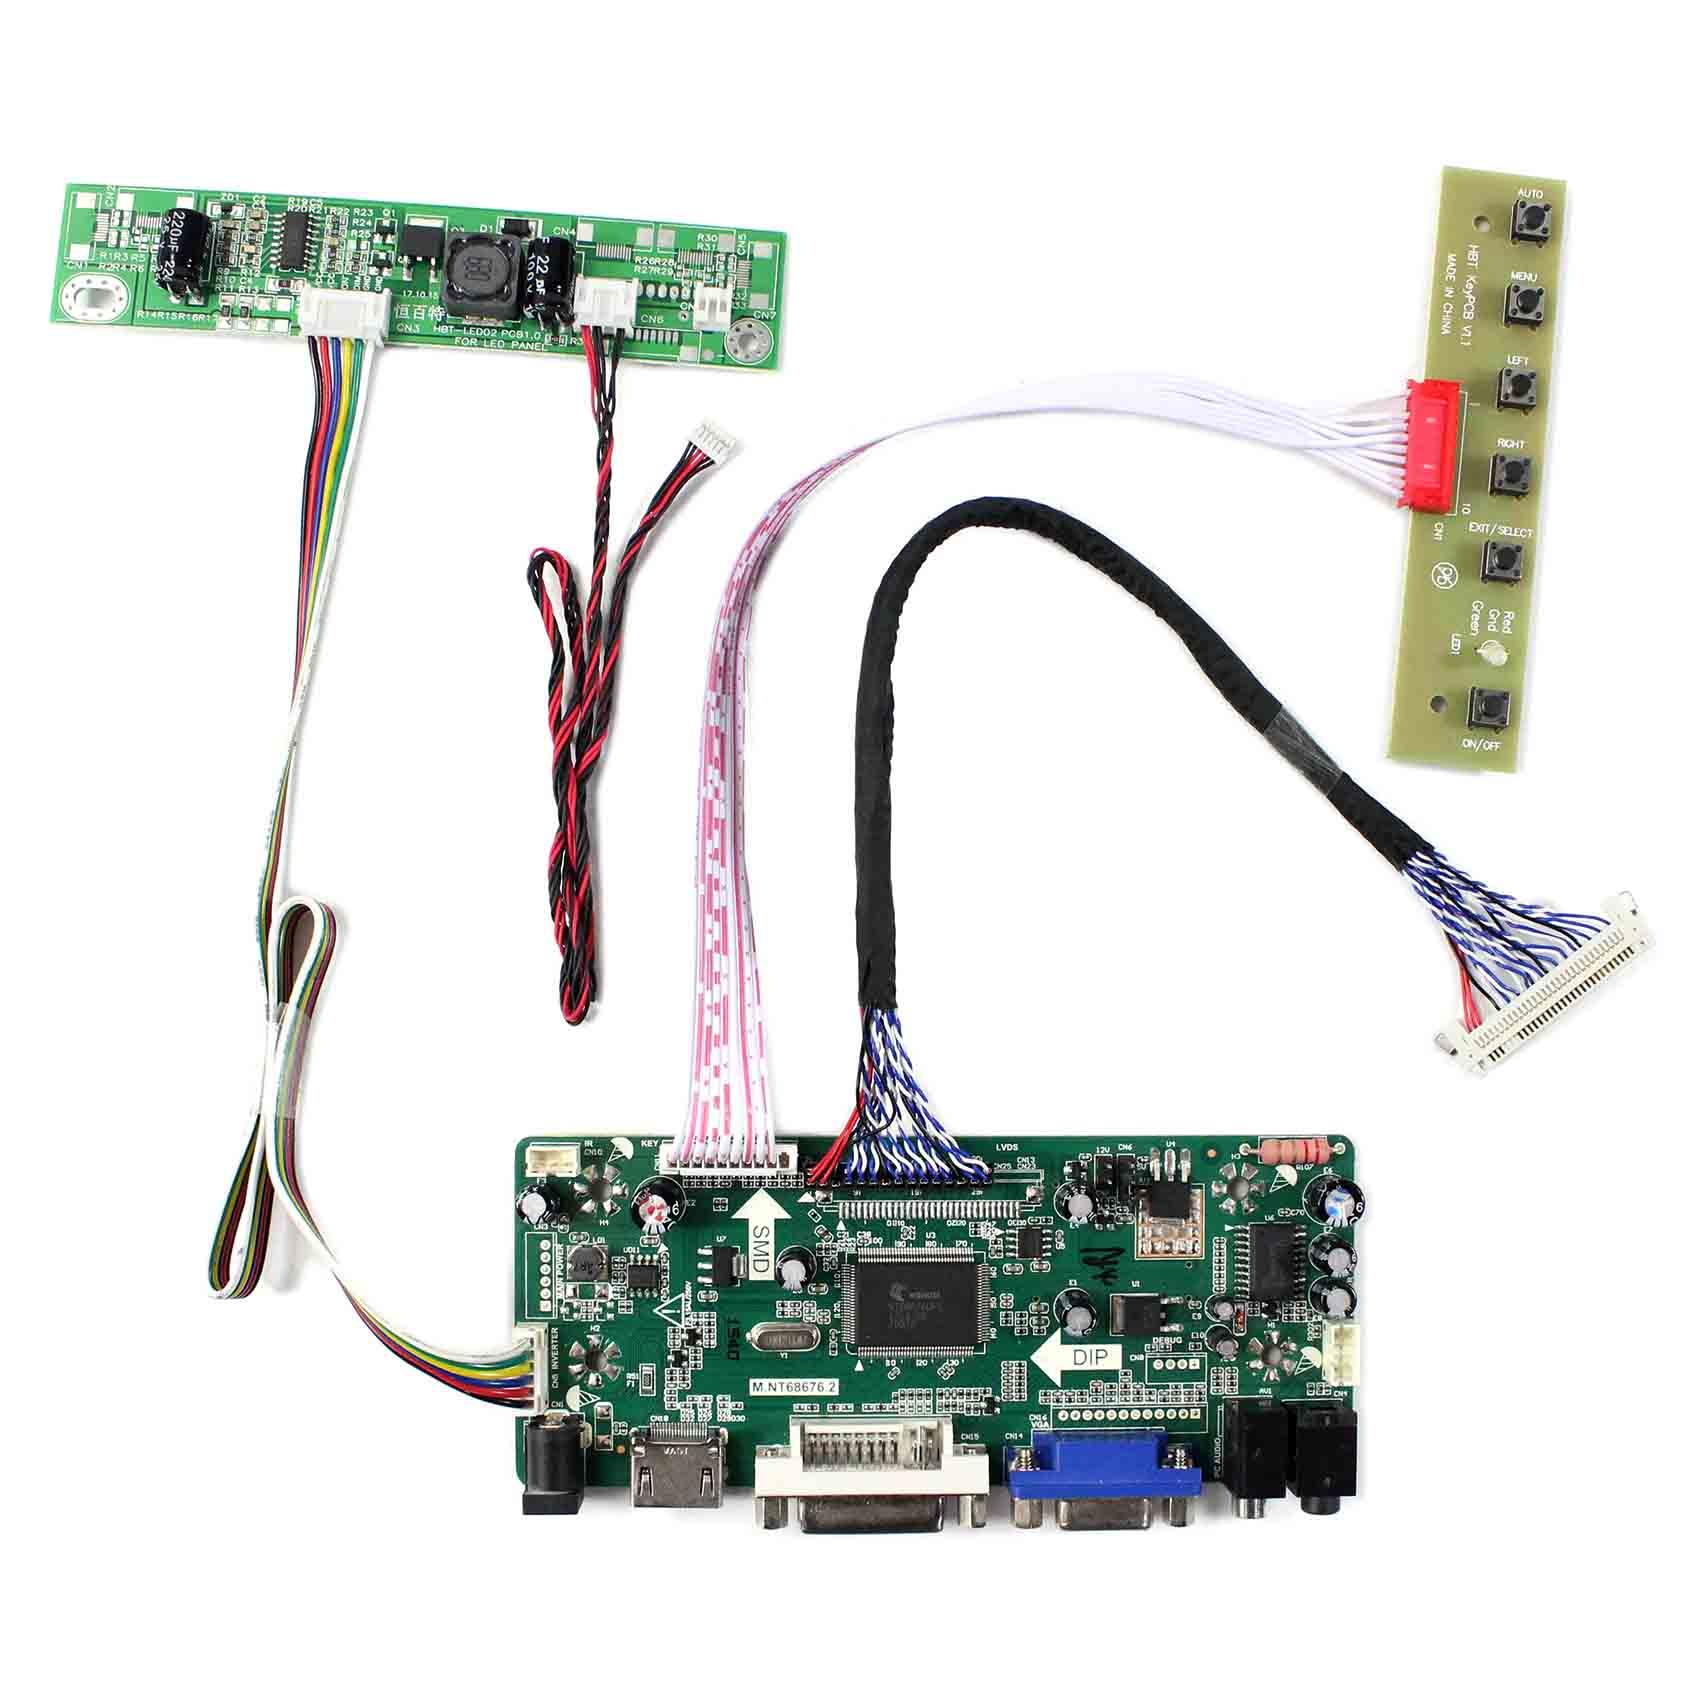 HDMI + DVI + VGA + オーディオコントローラボード M215HW01 ため VB 21.5 インチ 1920 × 1080 lcd スクリーン  グループ上の 家電製品 からの 交換部品 & アクセサリー の中 1